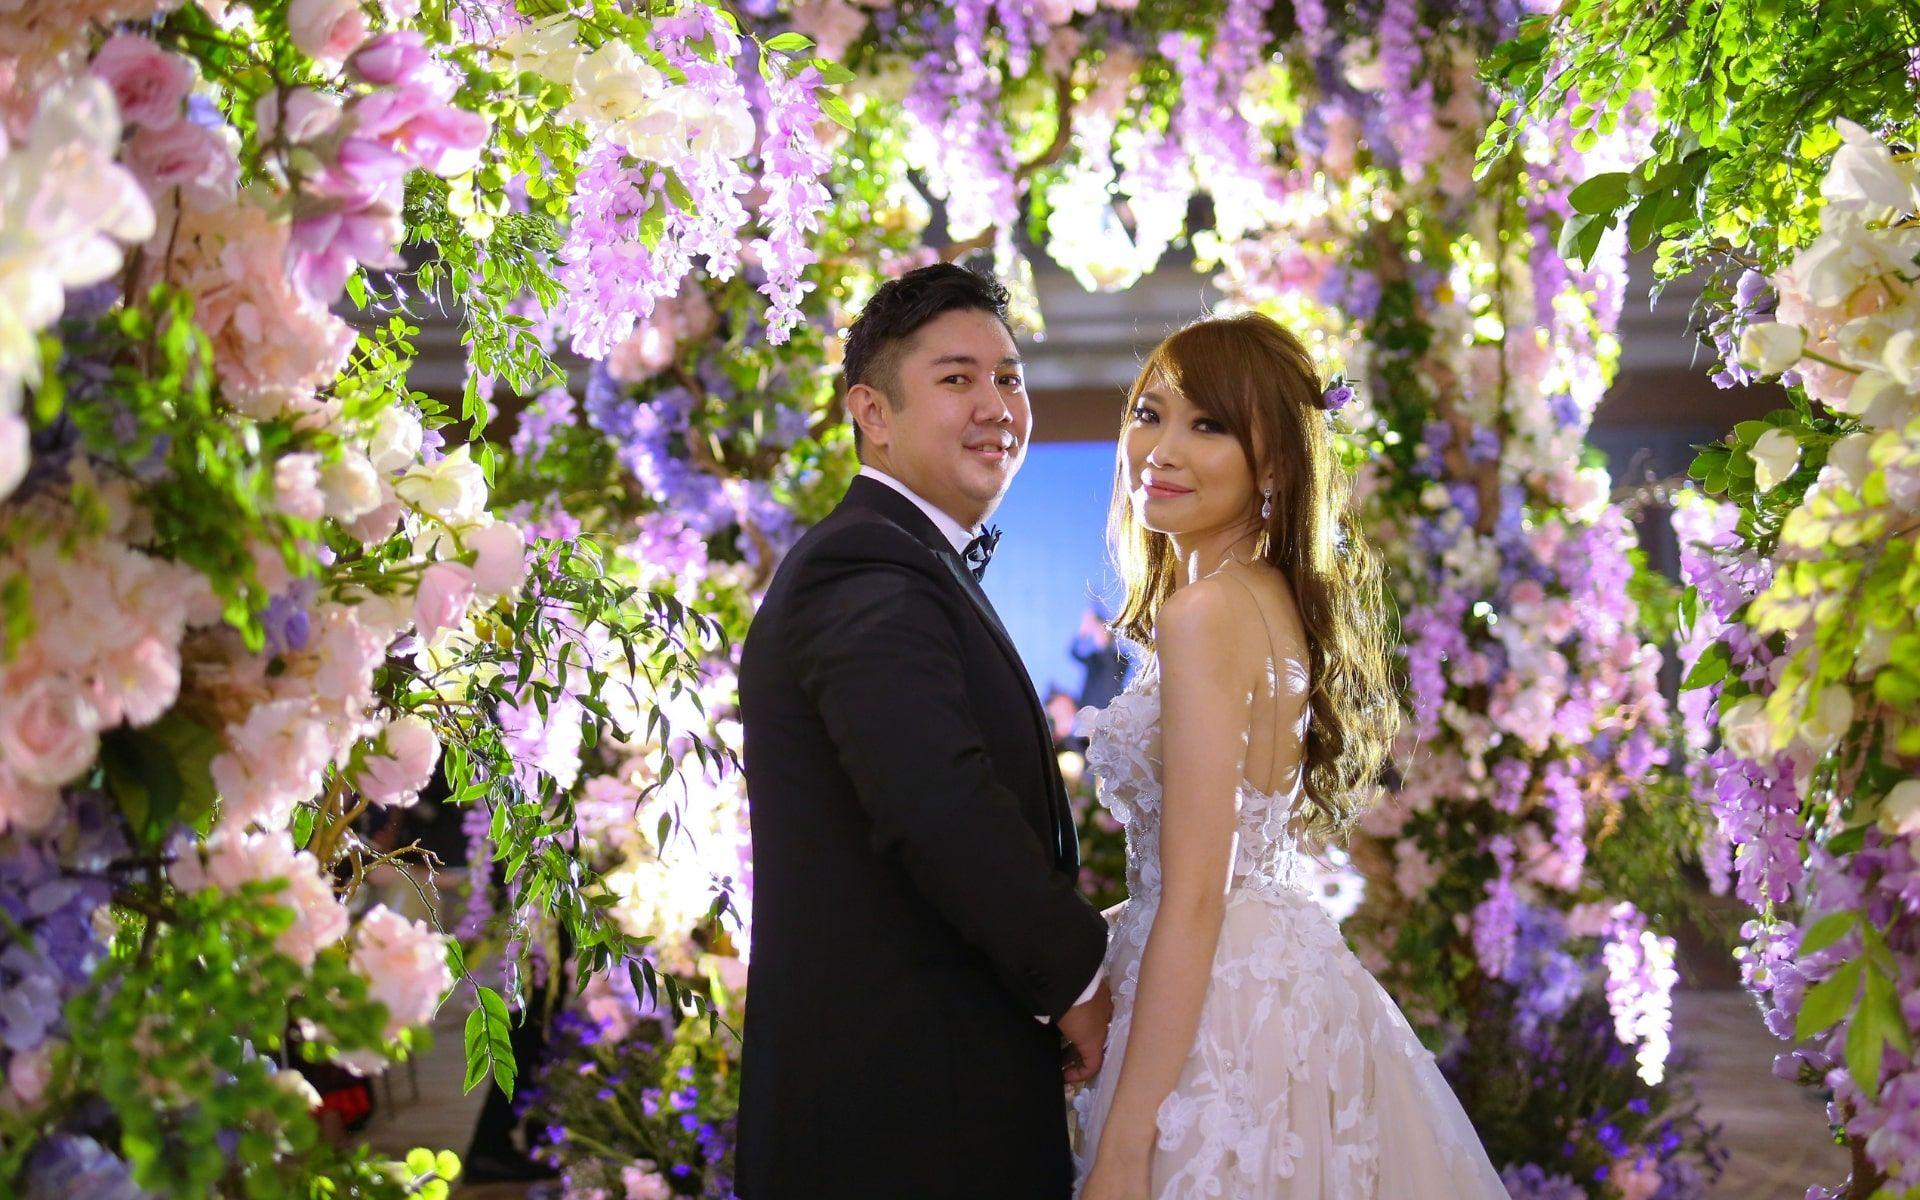 Christopher Tan San Ming and Melissa Lim Mae Lyn